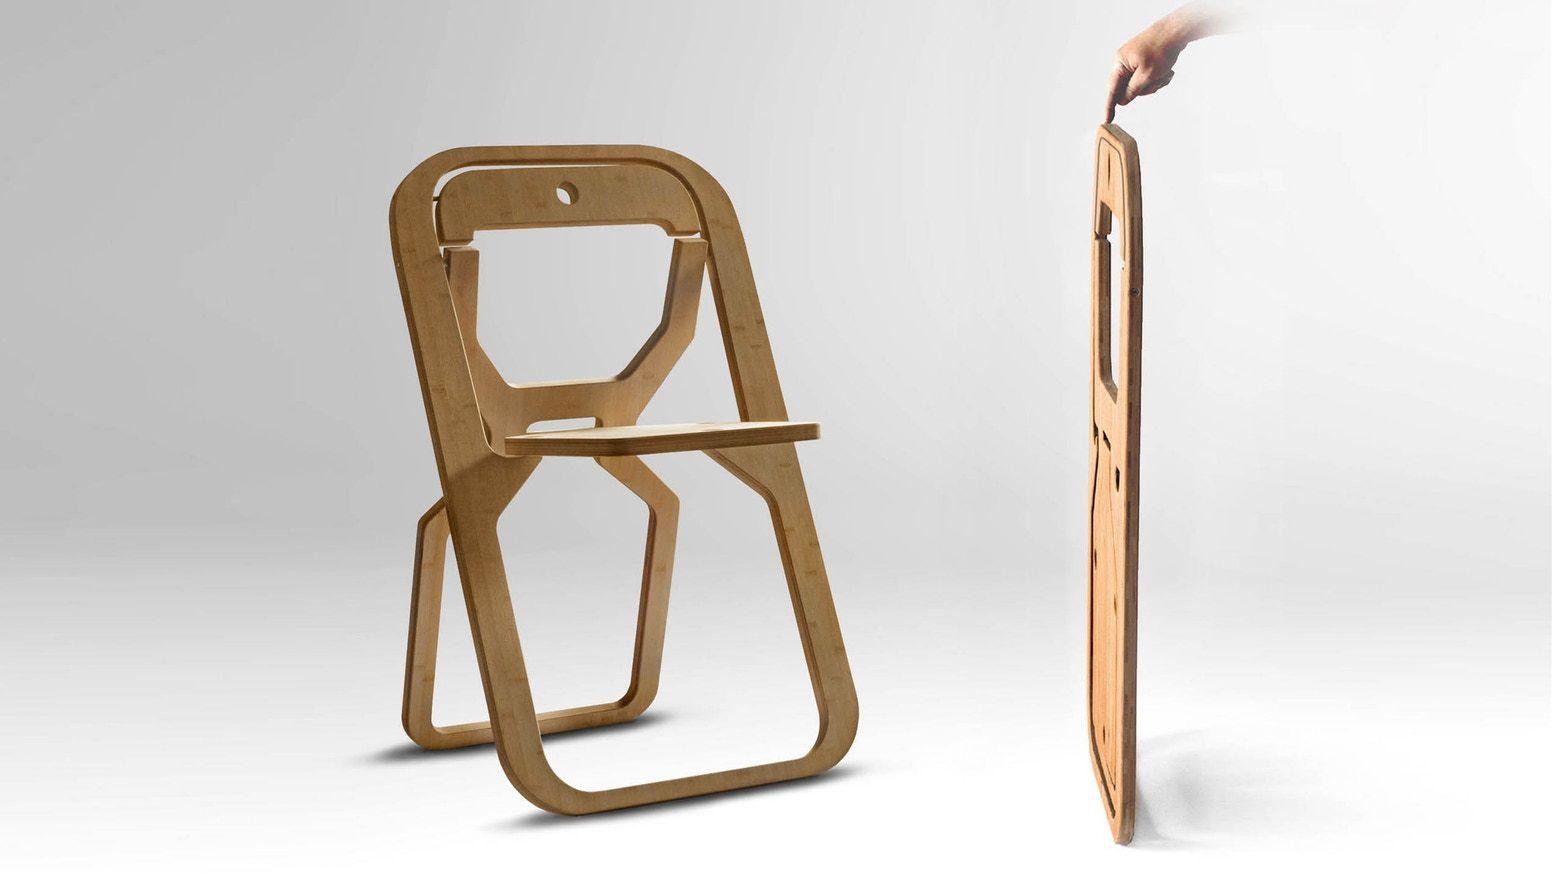 Peachy Infine Folding Chair By Desile Christian Kickstarter In Ibusinesslaw Wood Chair Design Ideas Ibusinesslaworg